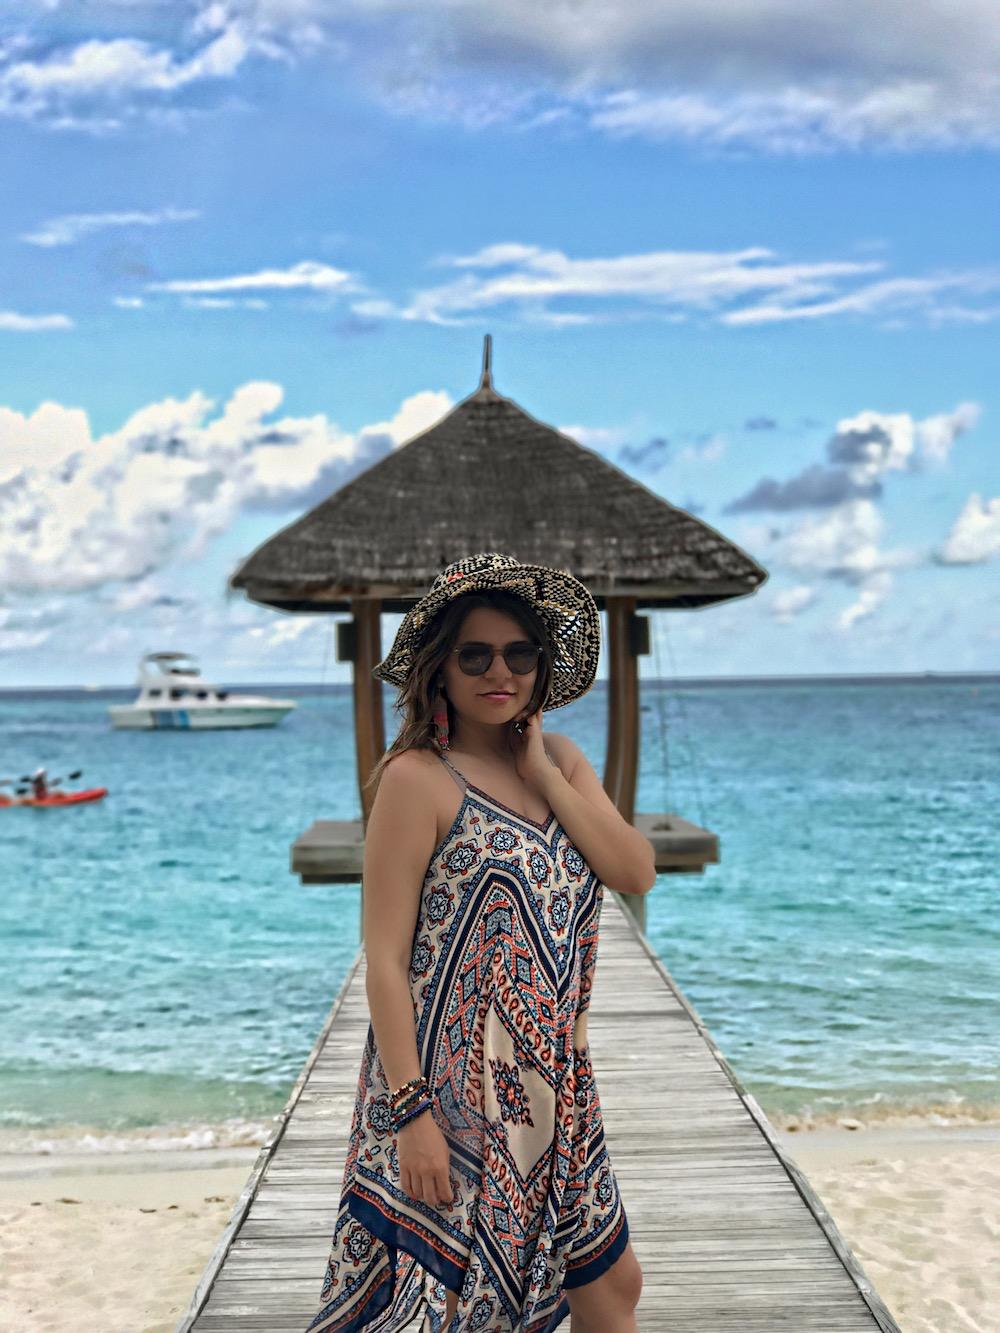 alley-girl-betul-yildiz-fashion-travel-life-style-blog